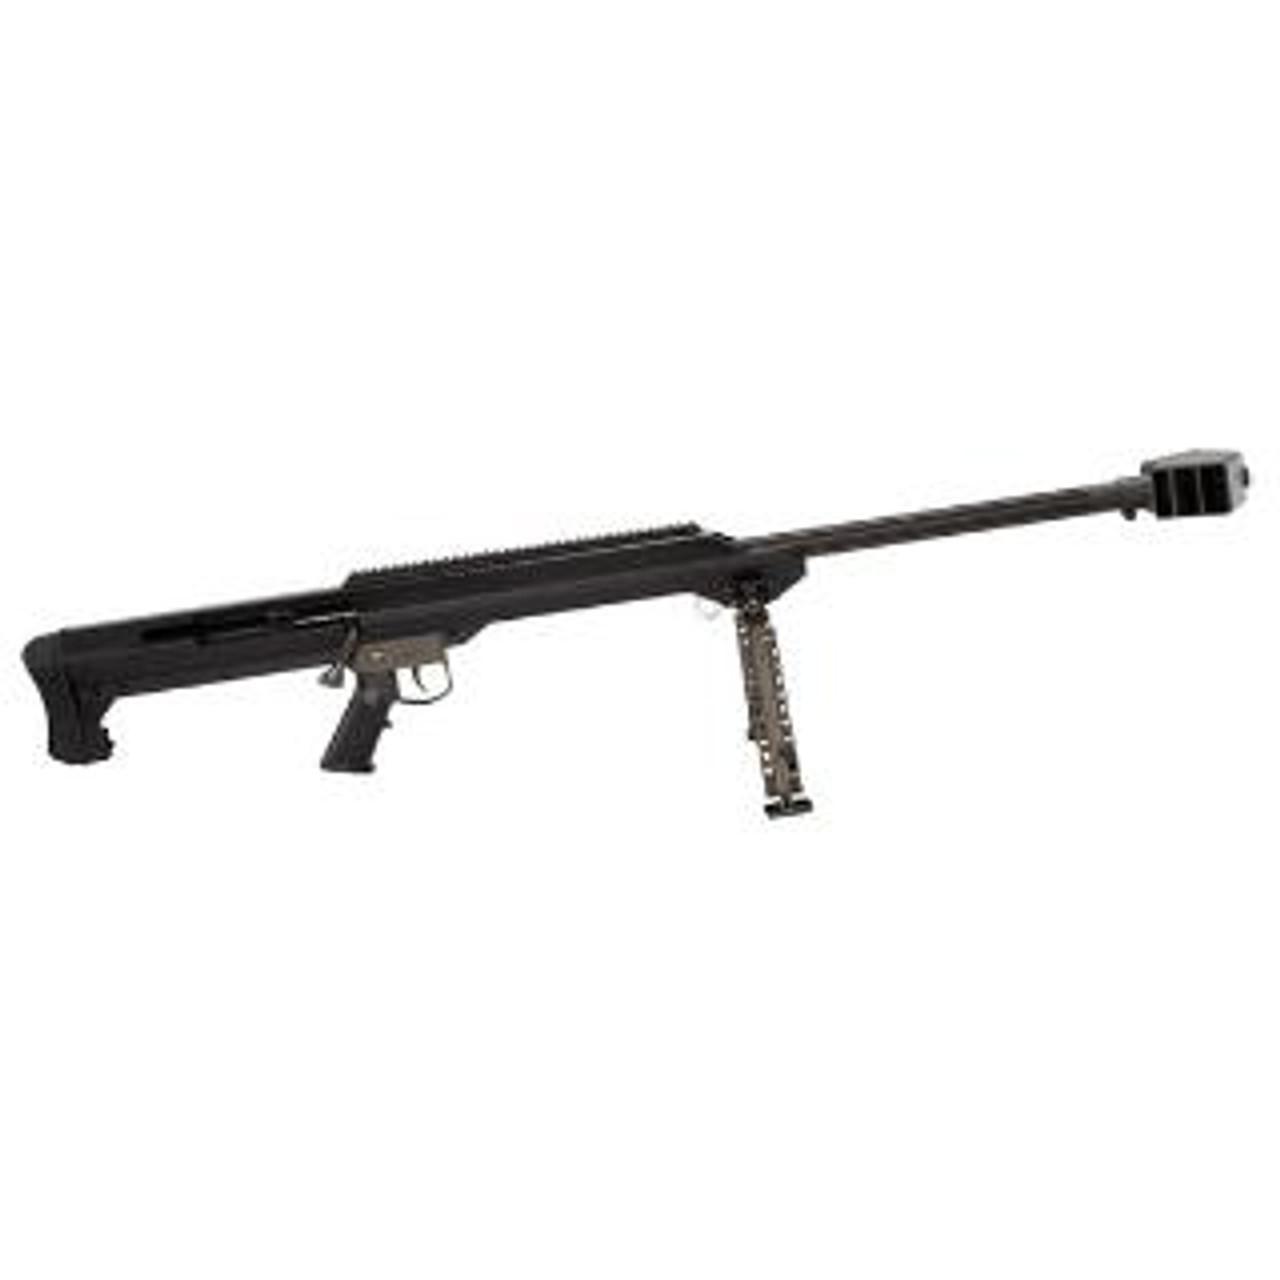 Barrett M99 CALIFORNIA LEGAL - .416